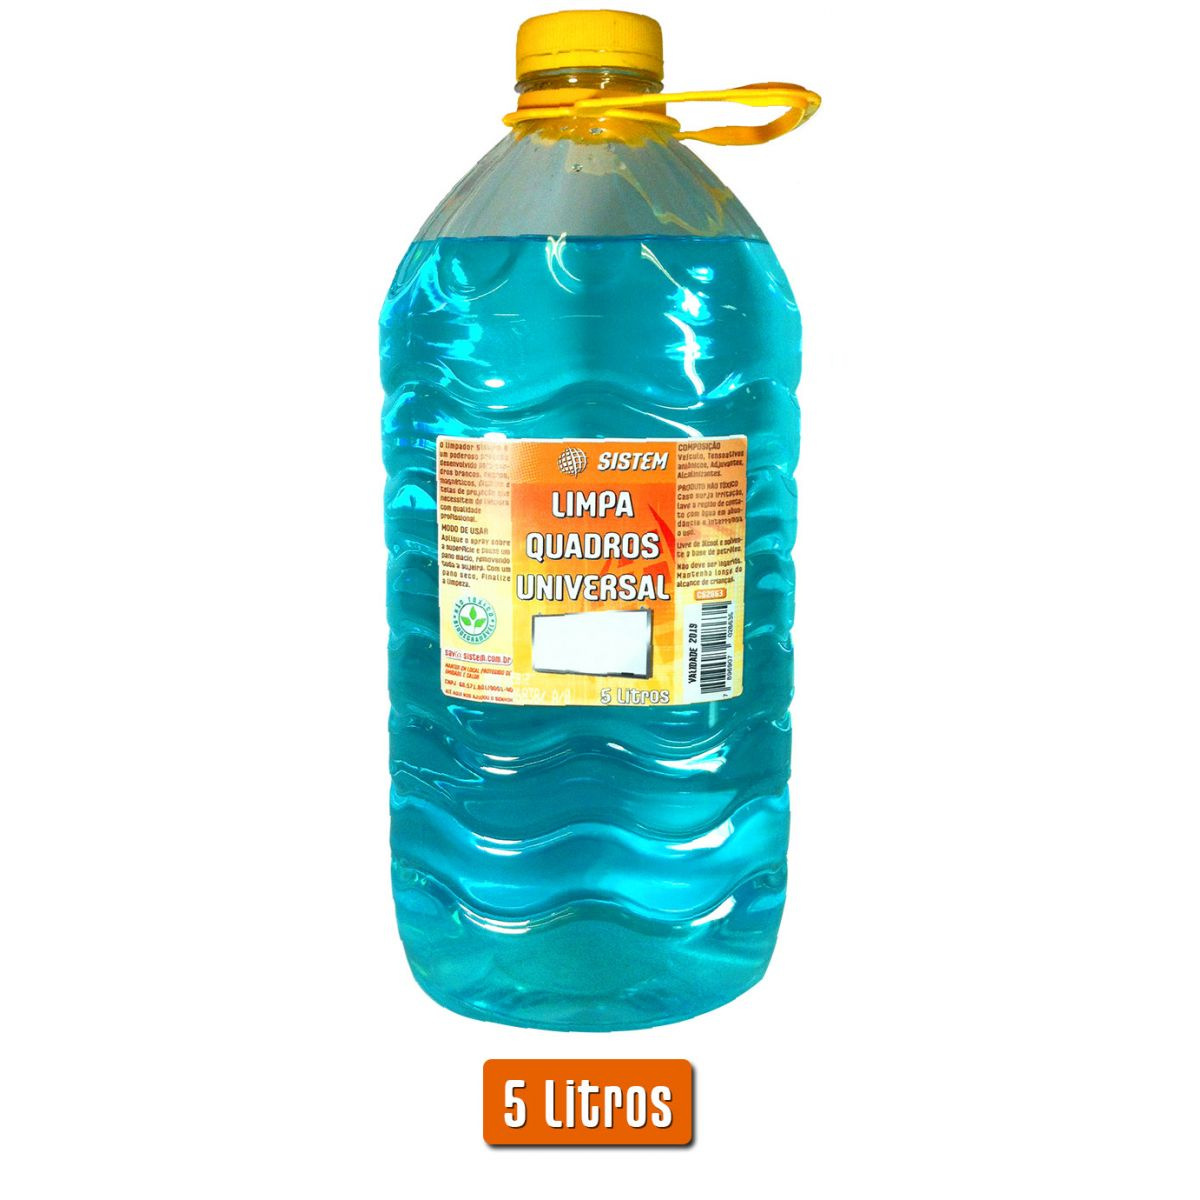 LÍQUIDO de LIMPEZA PARA QUADROS | 60 ml | 240 ml | 500 ml | 1 Litro | 5 Litros